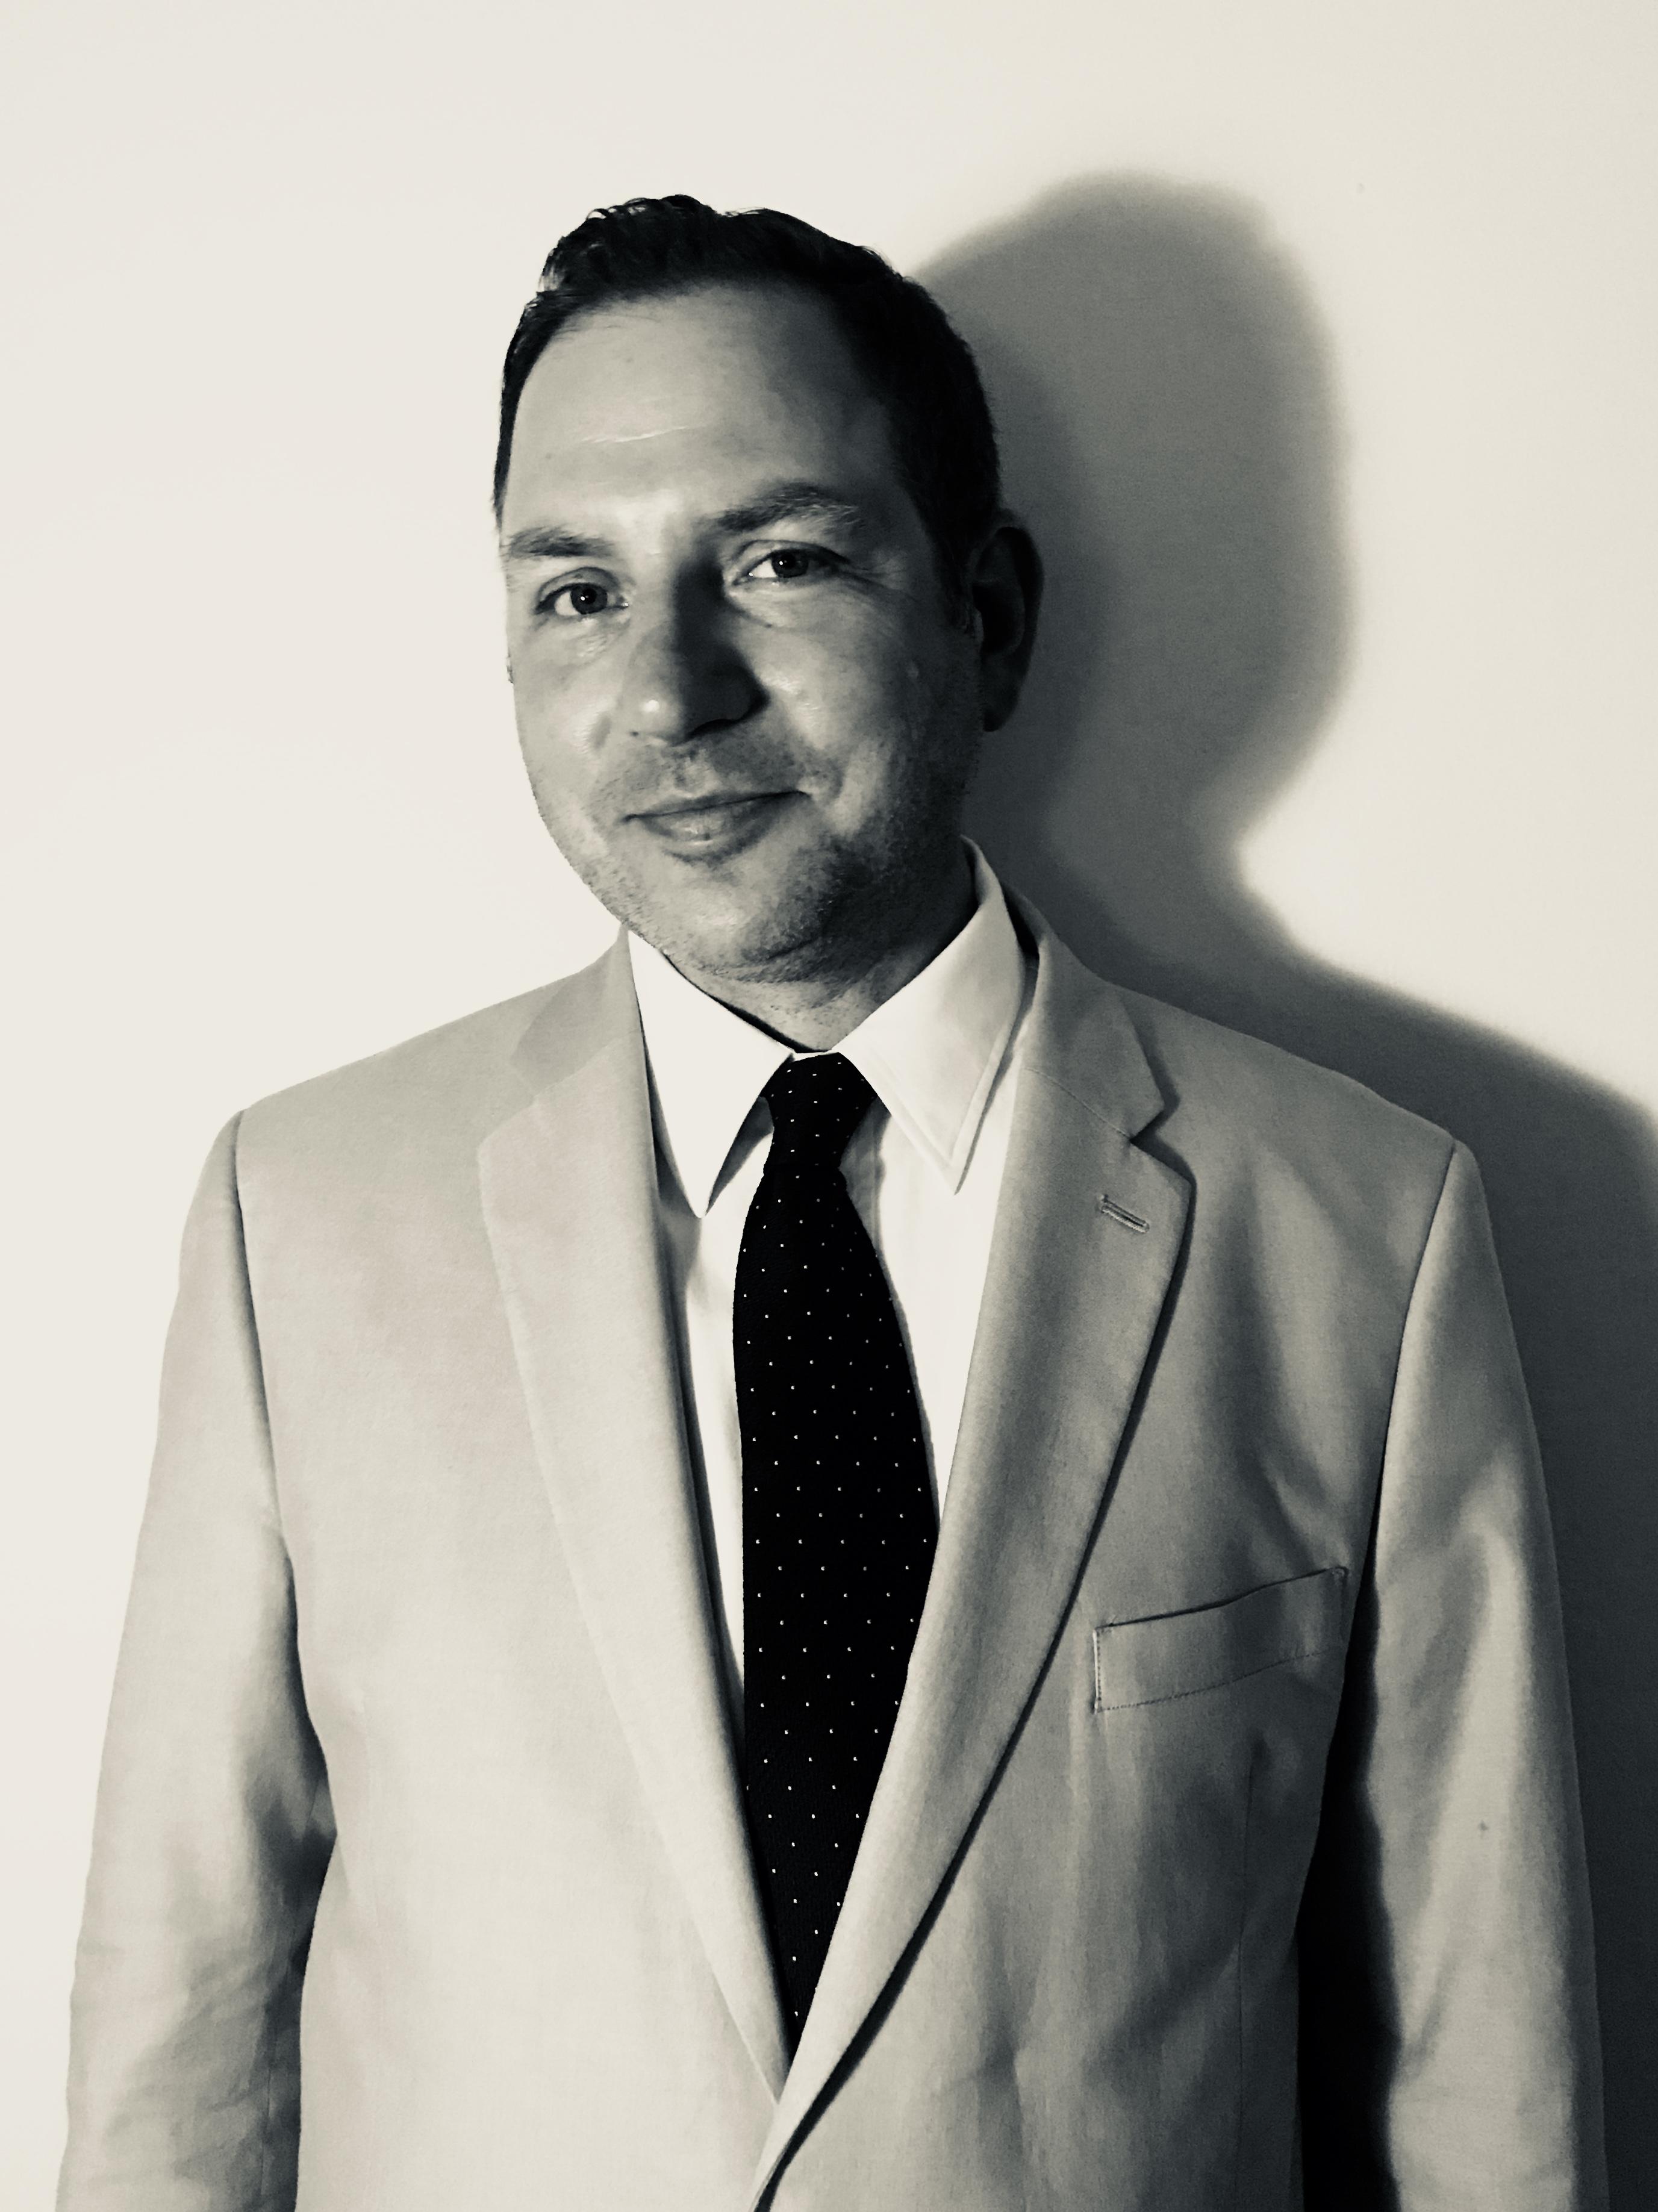 Todd Zachary